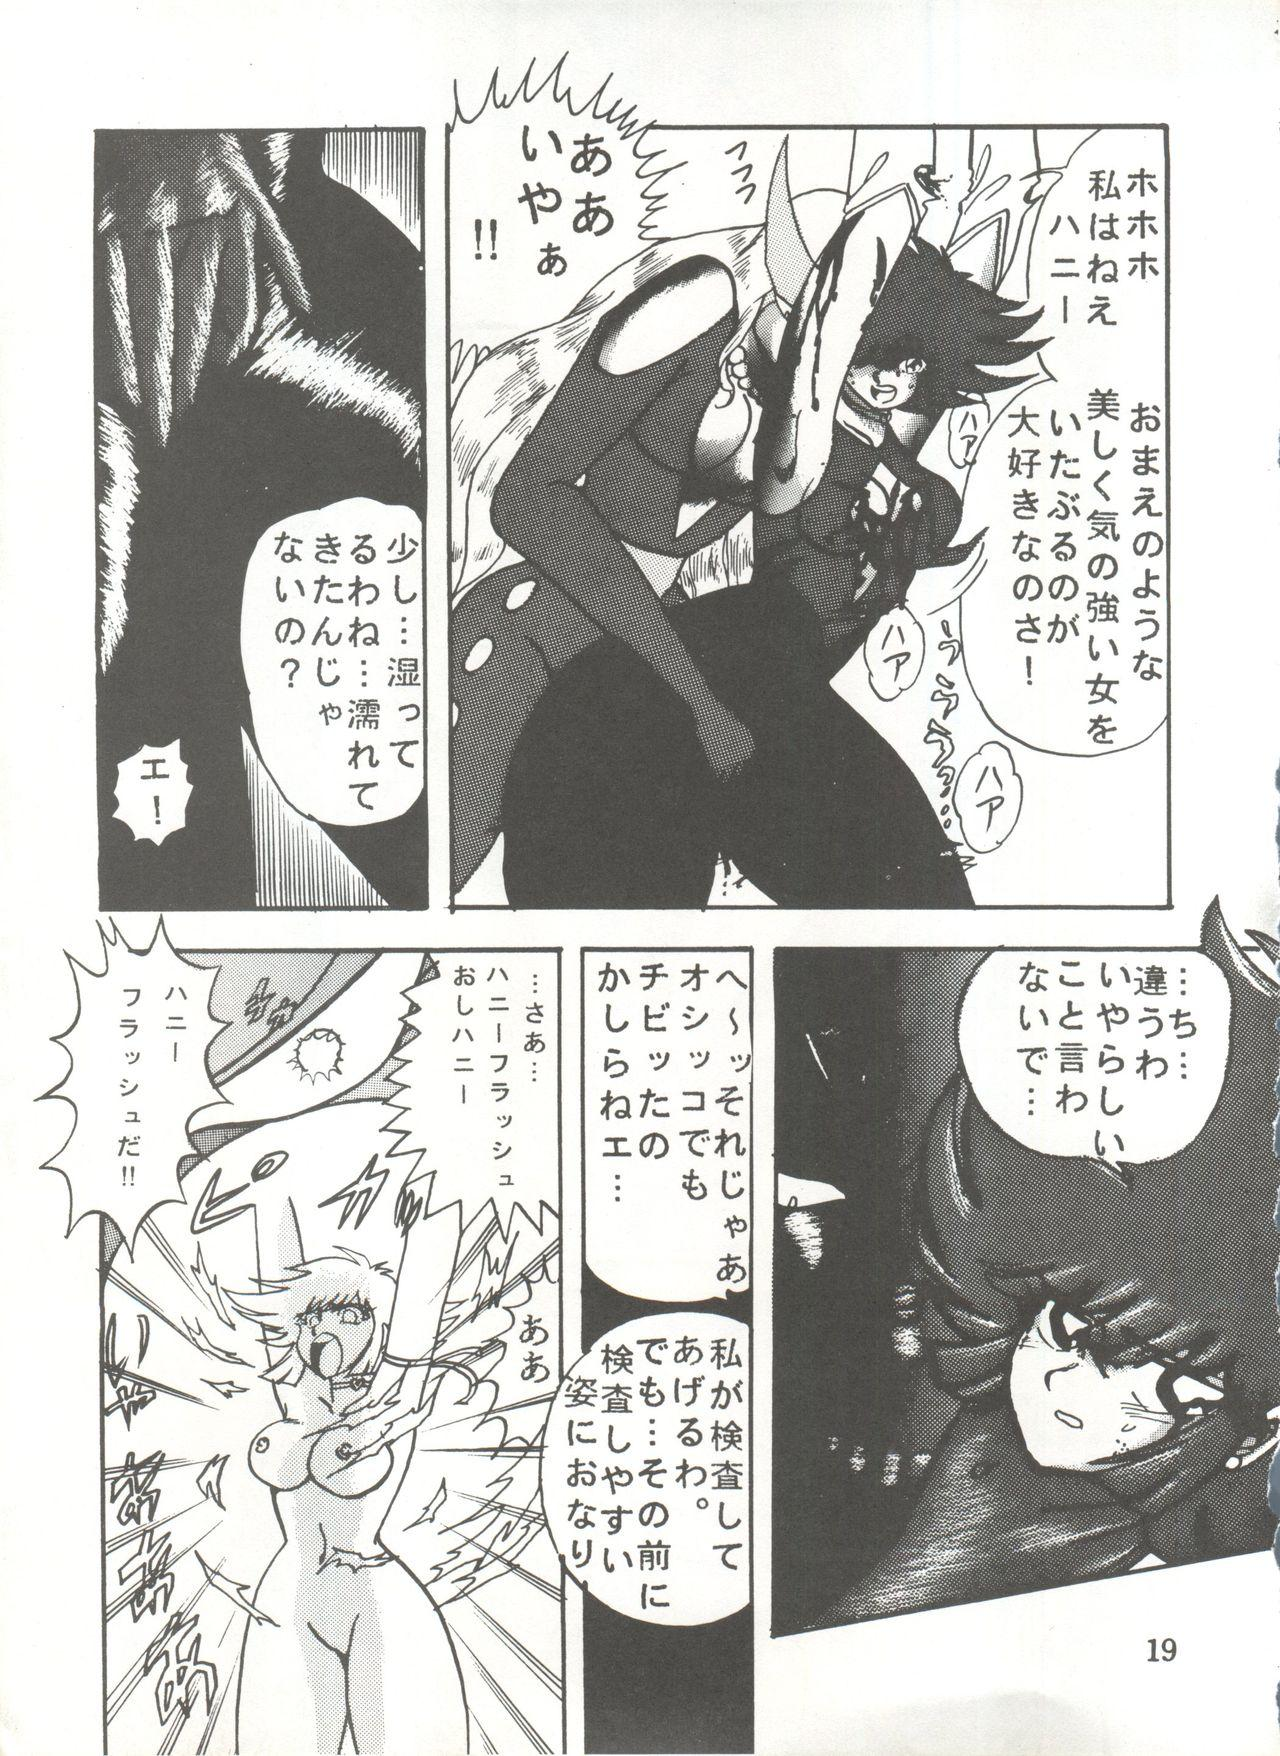 [Global One (MARO)] Sadistic 5 (Cutey Honey, Devilman, Sailor Moon), [Global One (MARO)] Sadistic (Dirty Pair, Fushigi no Umi no Nadia, Sailor Moon), [Studio Ikkatsumajin] .ribbon (Hime-chan's Ribbon) 18